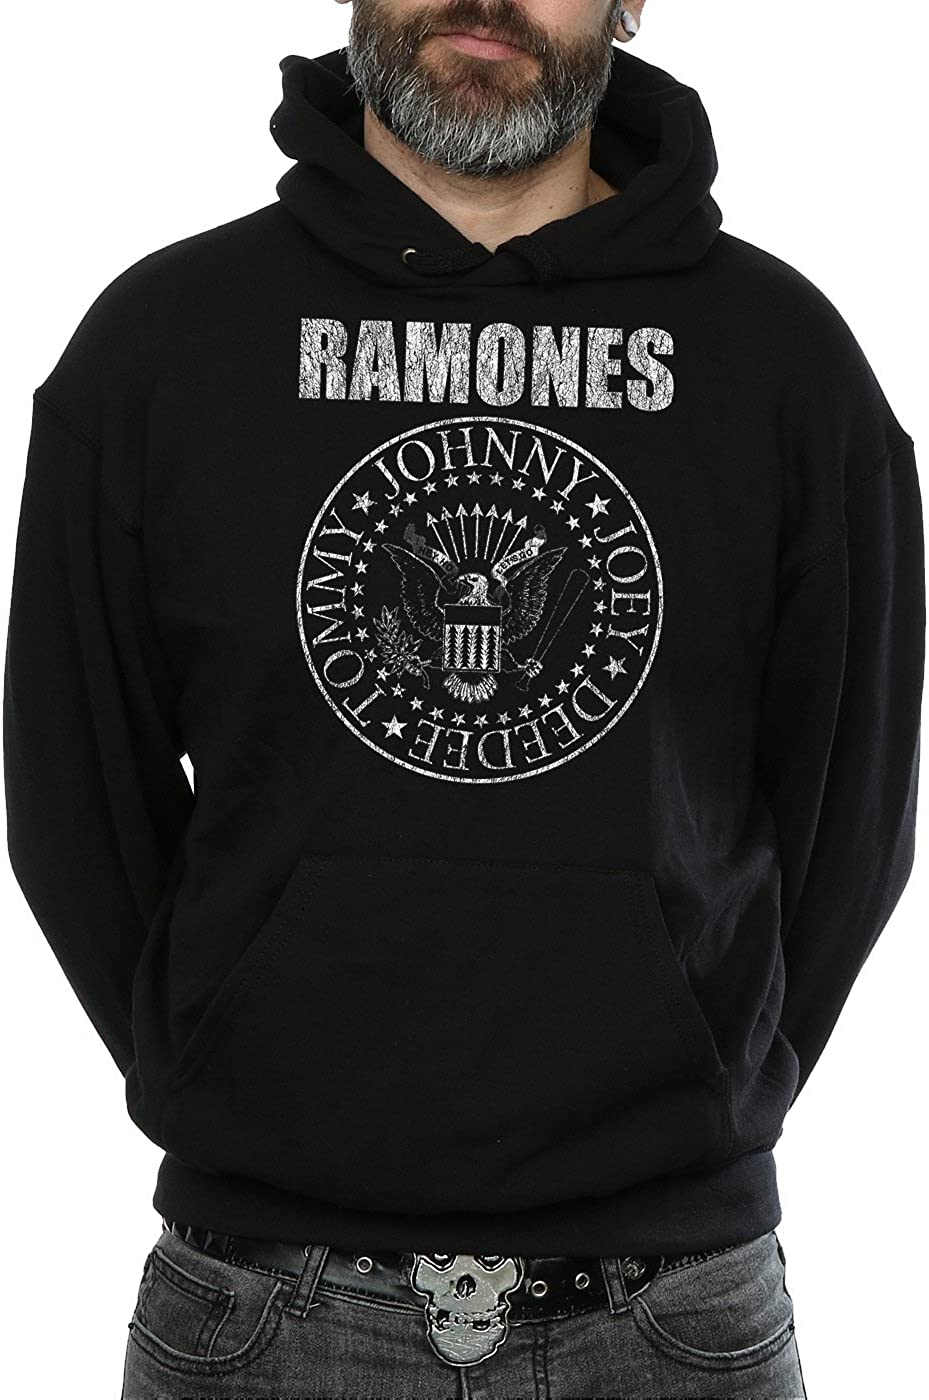 G/én/érique Ramones Homme Presidential Seal Sweat-Shirt